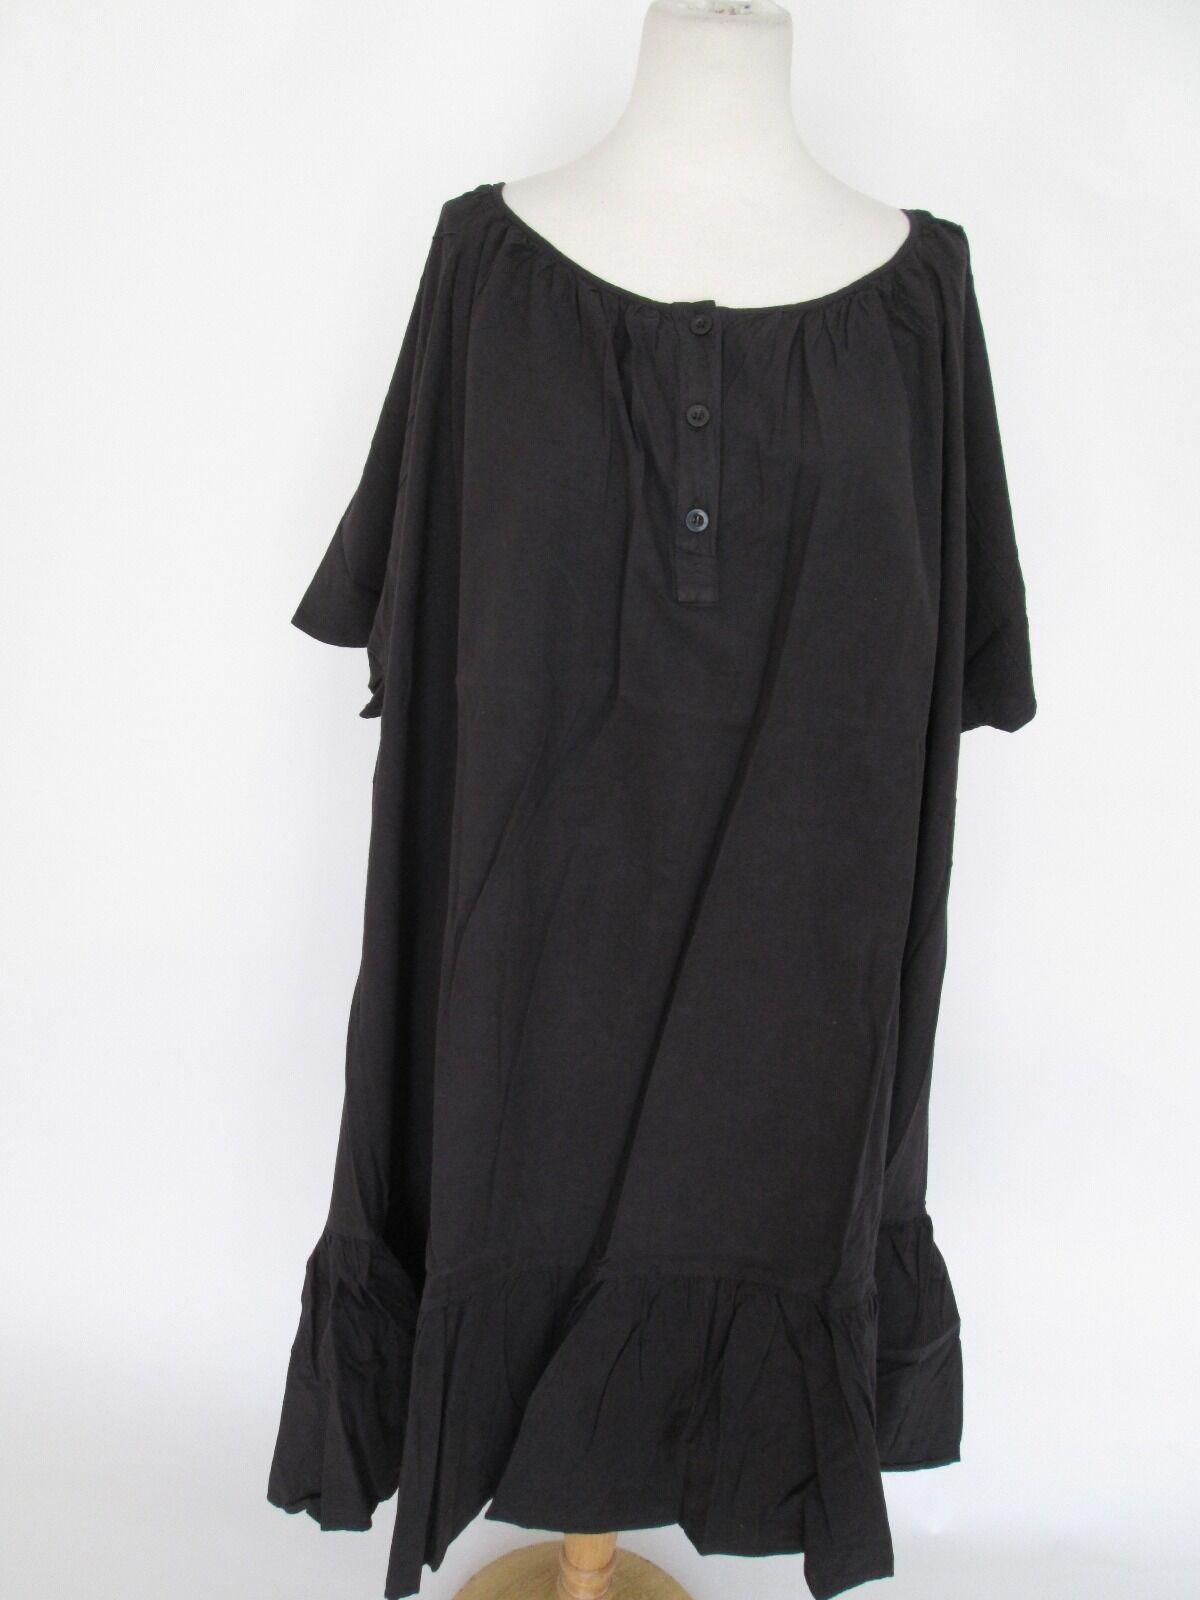 MOO-MOO CRINKLE DRESS BY CHANNA-,2X,3,X4X,5X,6X